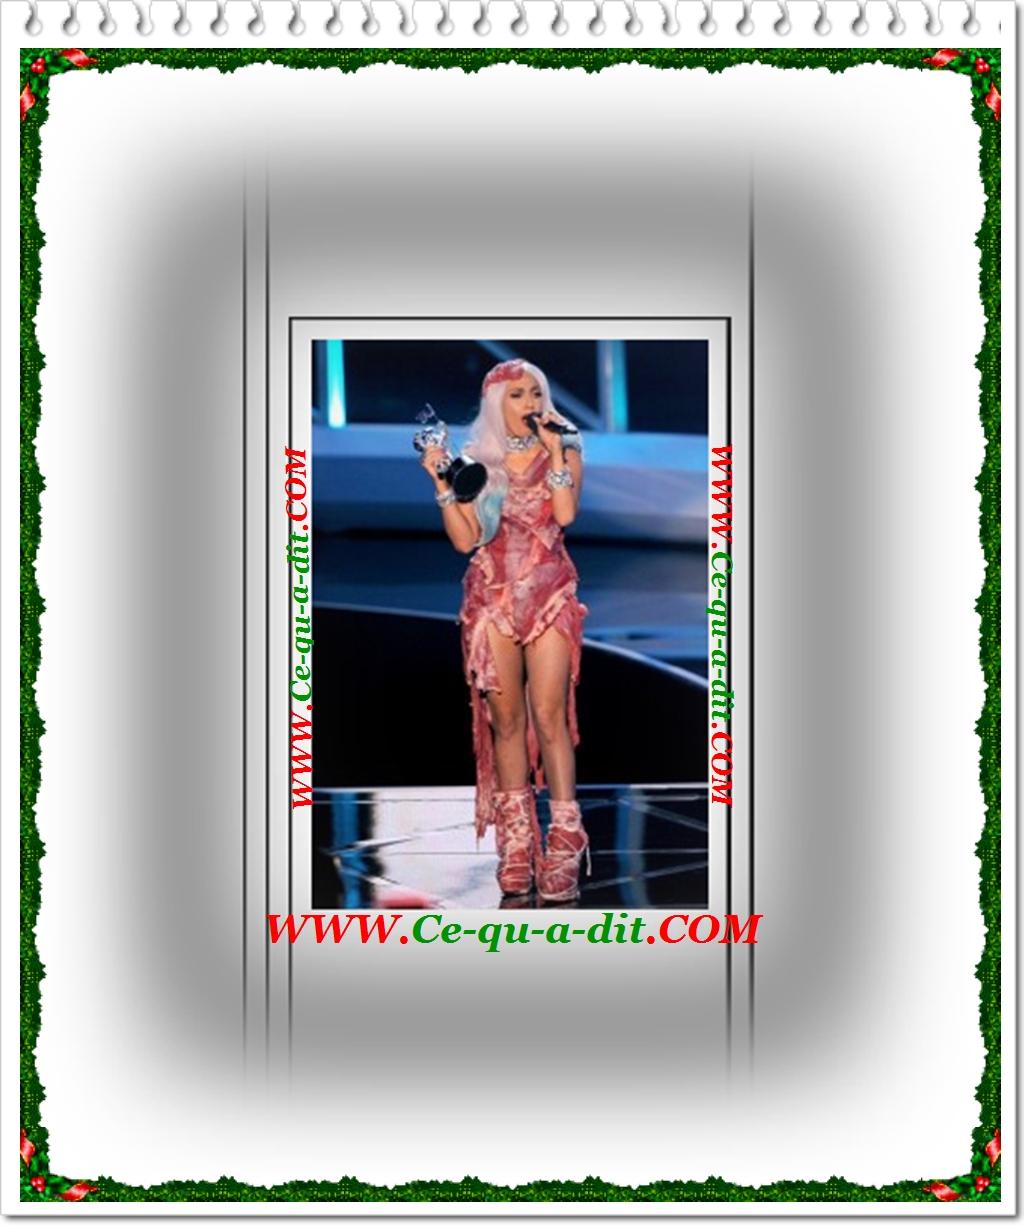 http://4.bp.blogspot.com/-h-0MXFGtsJM/Tf1BayBuQeI/AAAAAAAAEv4/m3GWuFGf1FY/s1600/lady-gaga-robe-en-viande.jpg